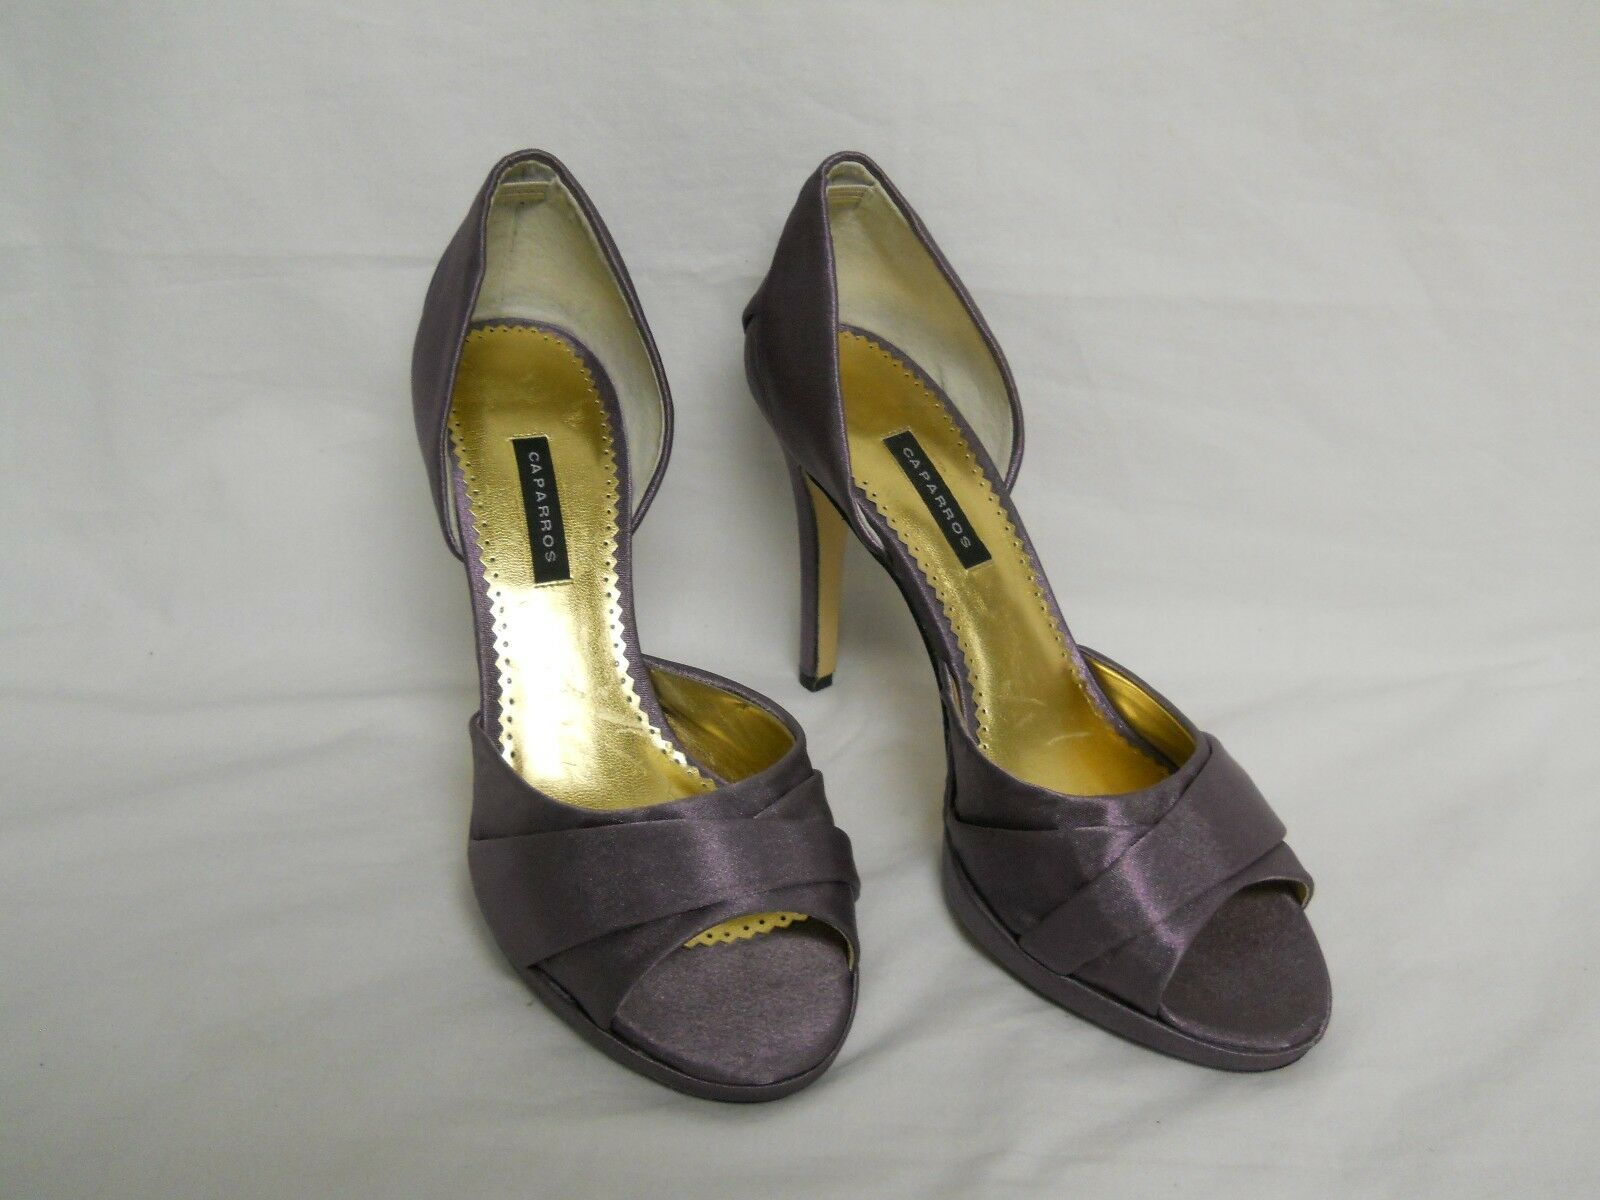 in vendita online Caparros New New New donna Lizzie Nightfall Crepe Open Toe D'Orsay Heels 9 M scarpe NWOB  confortevole